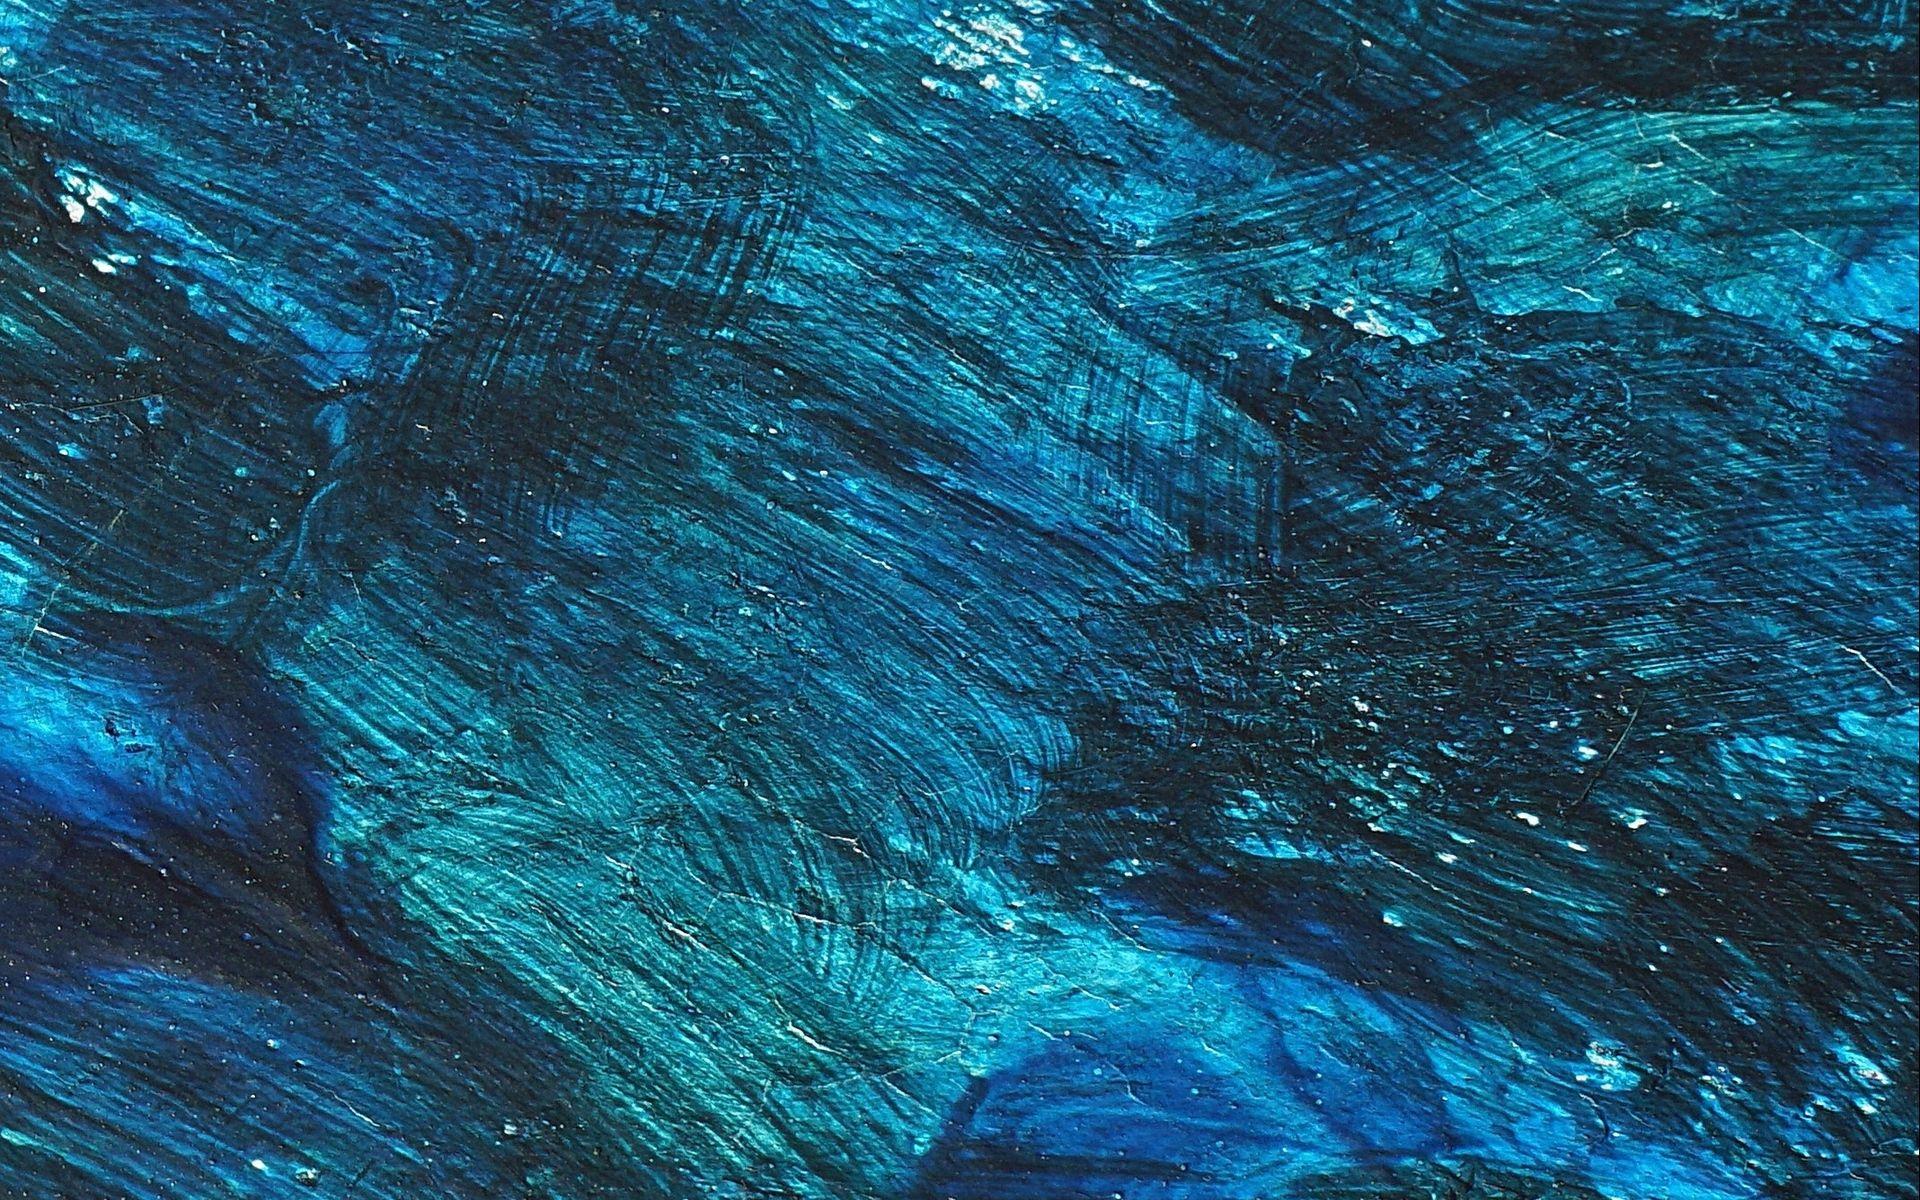 Rough Texture Wallpaper Hd Texture Painting Textured Wallpaper Blue Paint